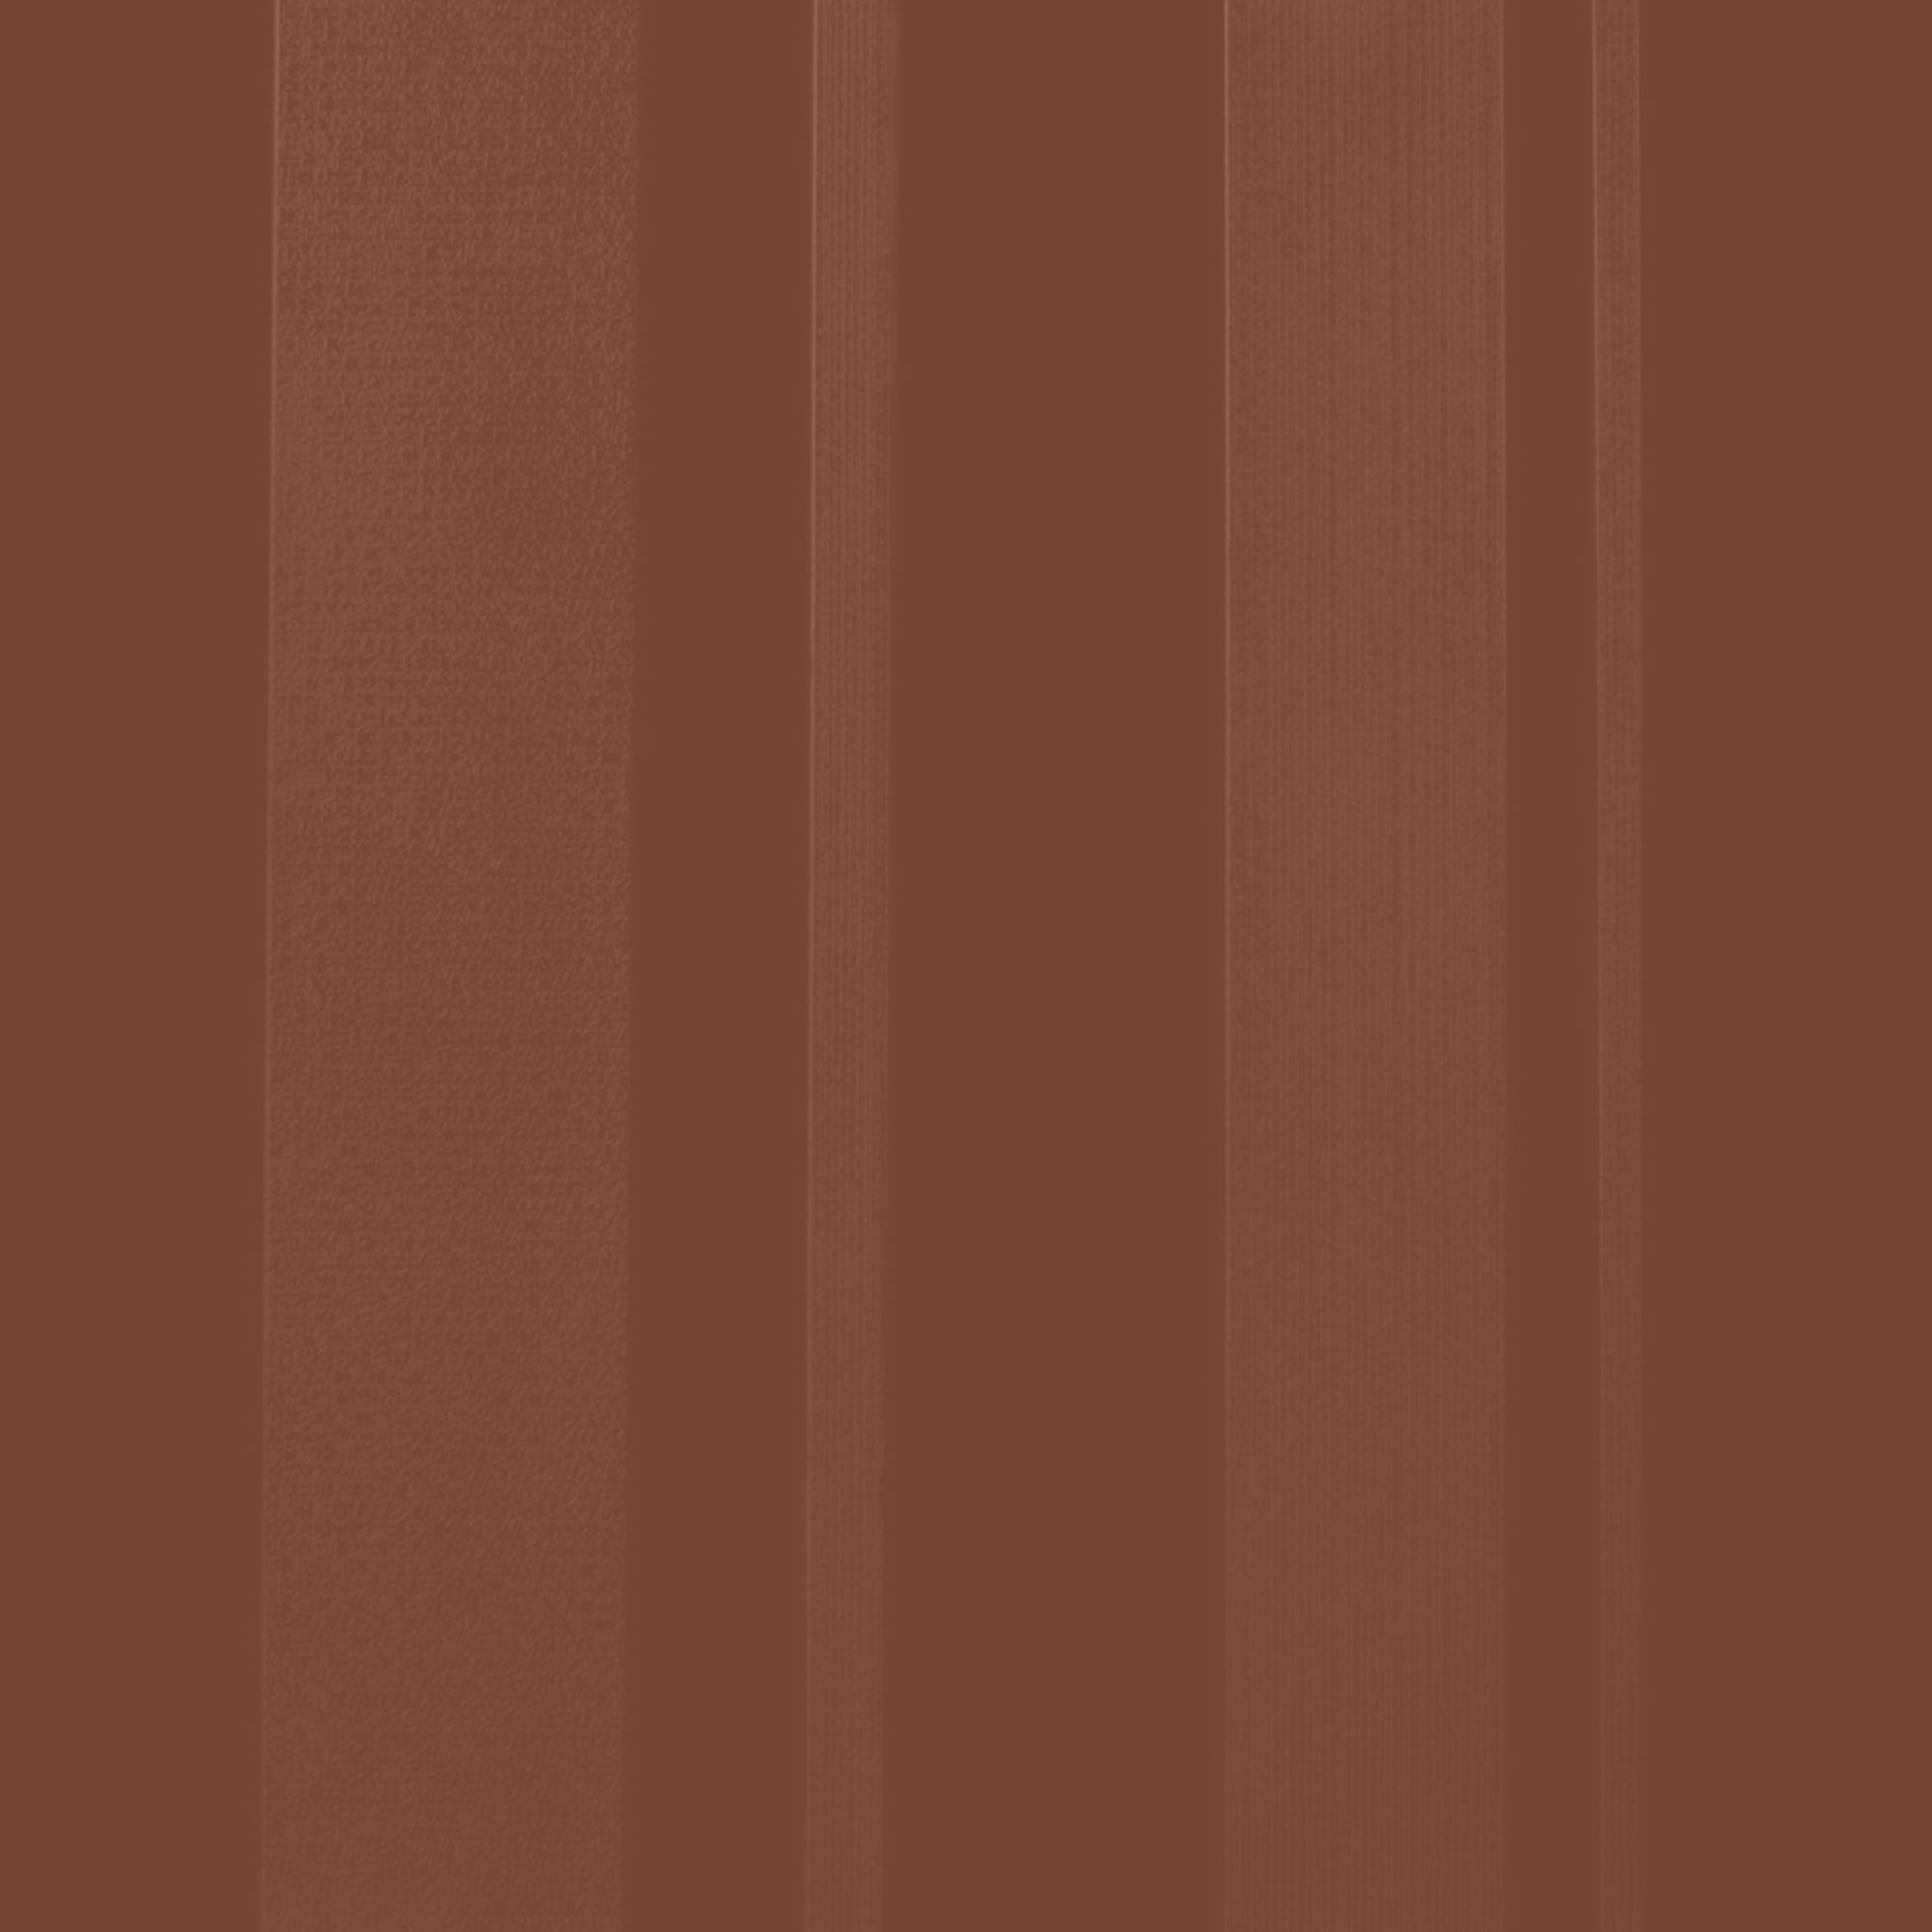 Roppe Dimensions Tile - Stripe Design Brick Rubber Flooring